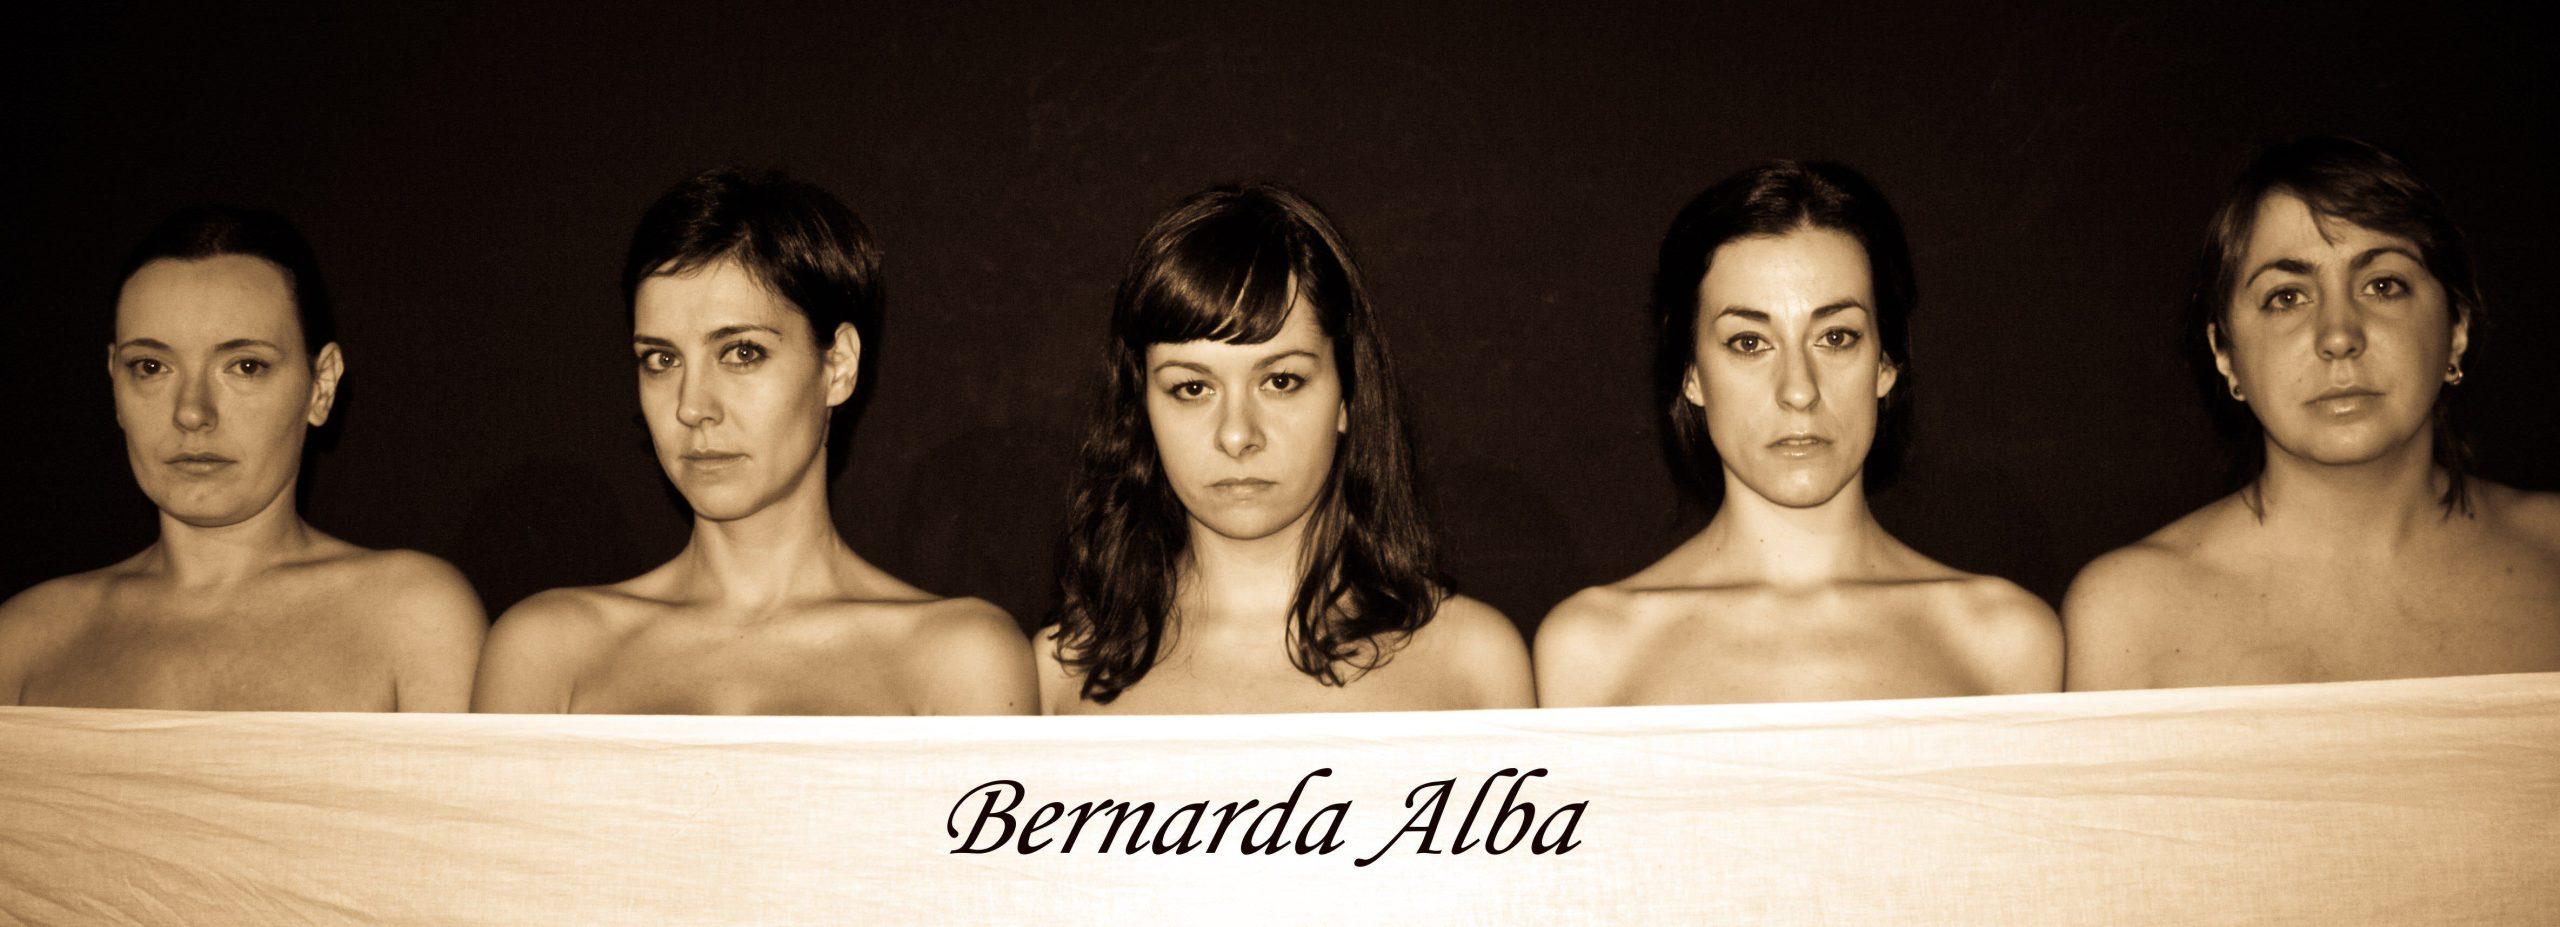 Bernarda Alba-5